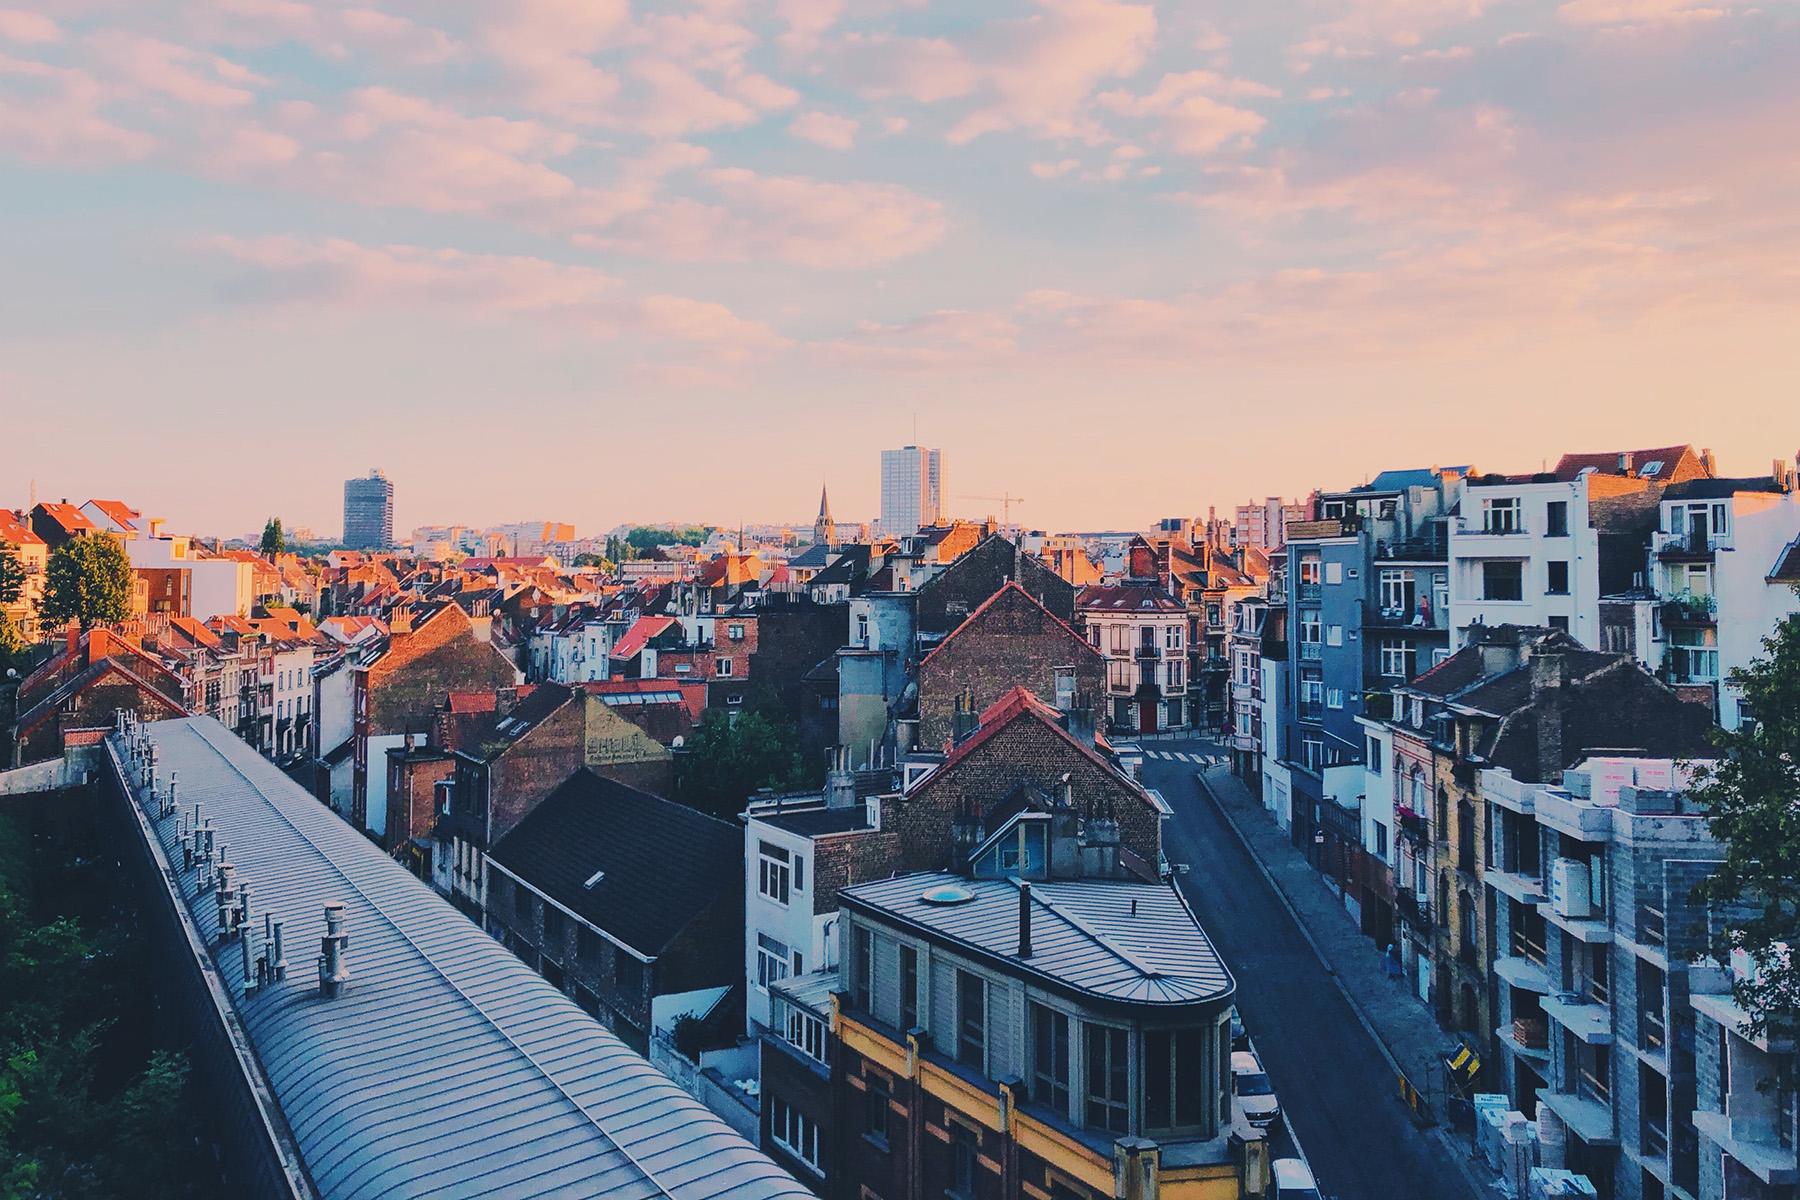 A Brussels neighborhood